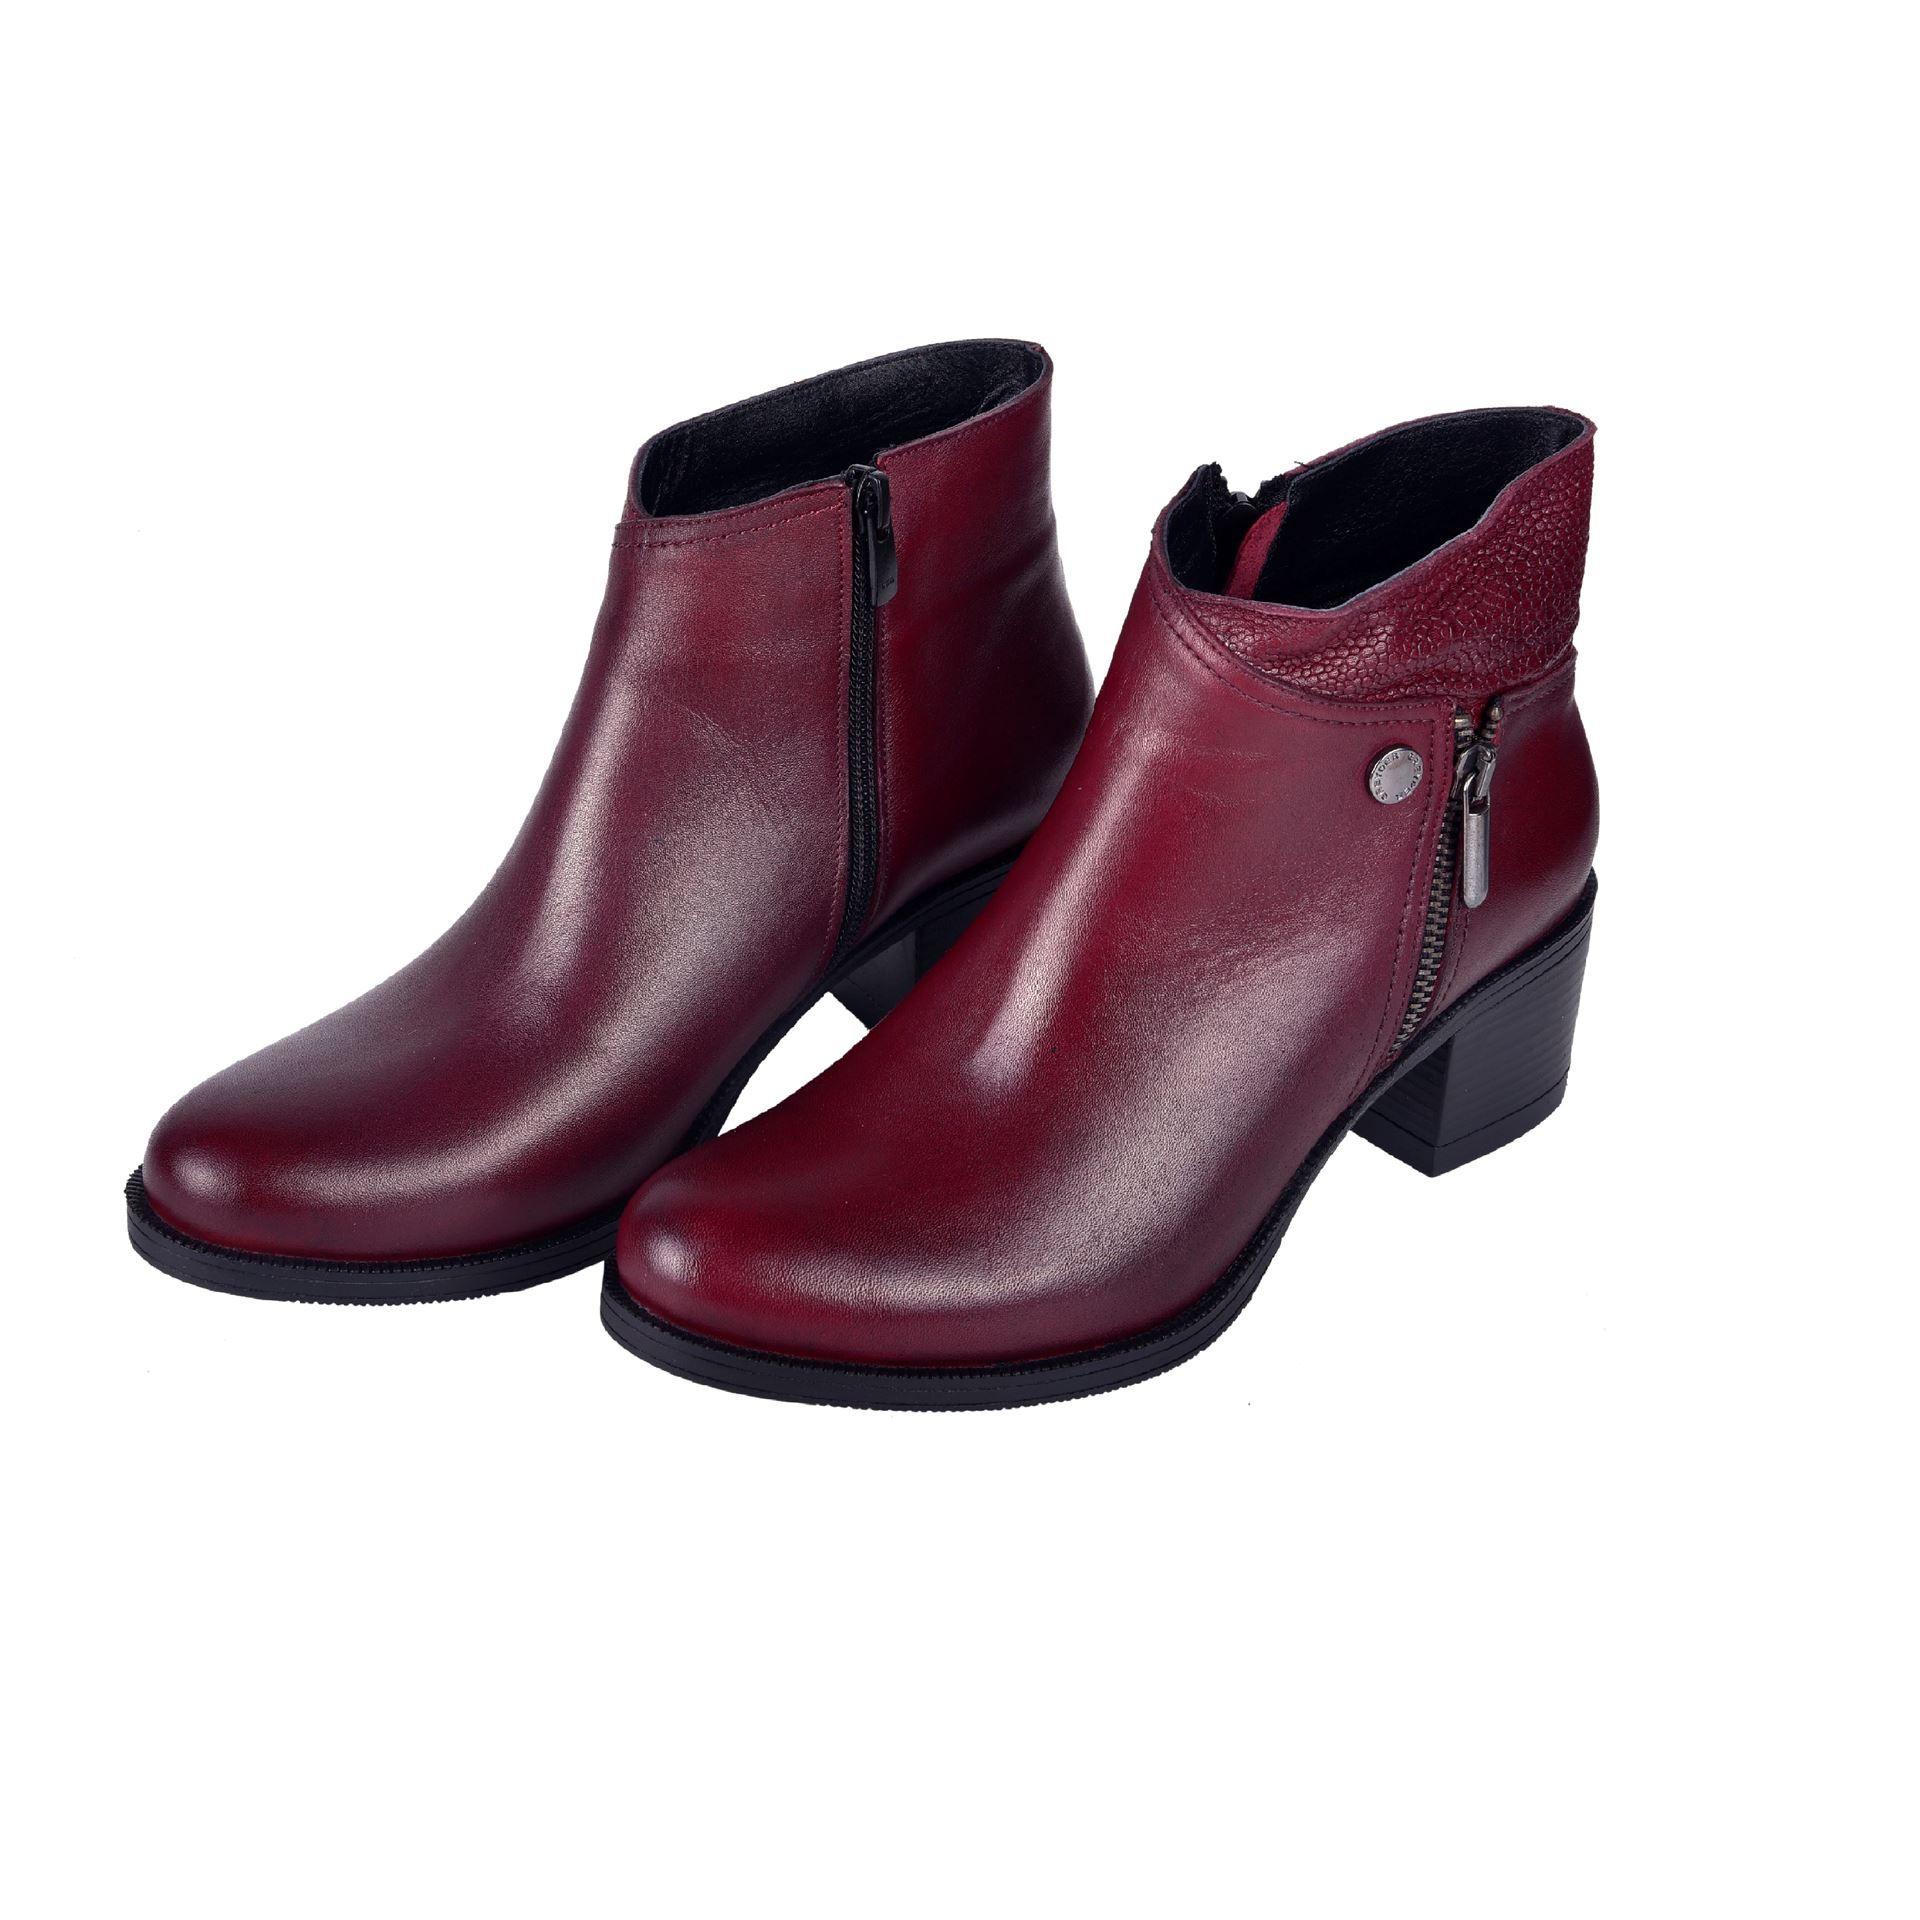 50531 Gunluk Kadin Bot Bordo Greyder Com Ankle Boot Boots Shoes